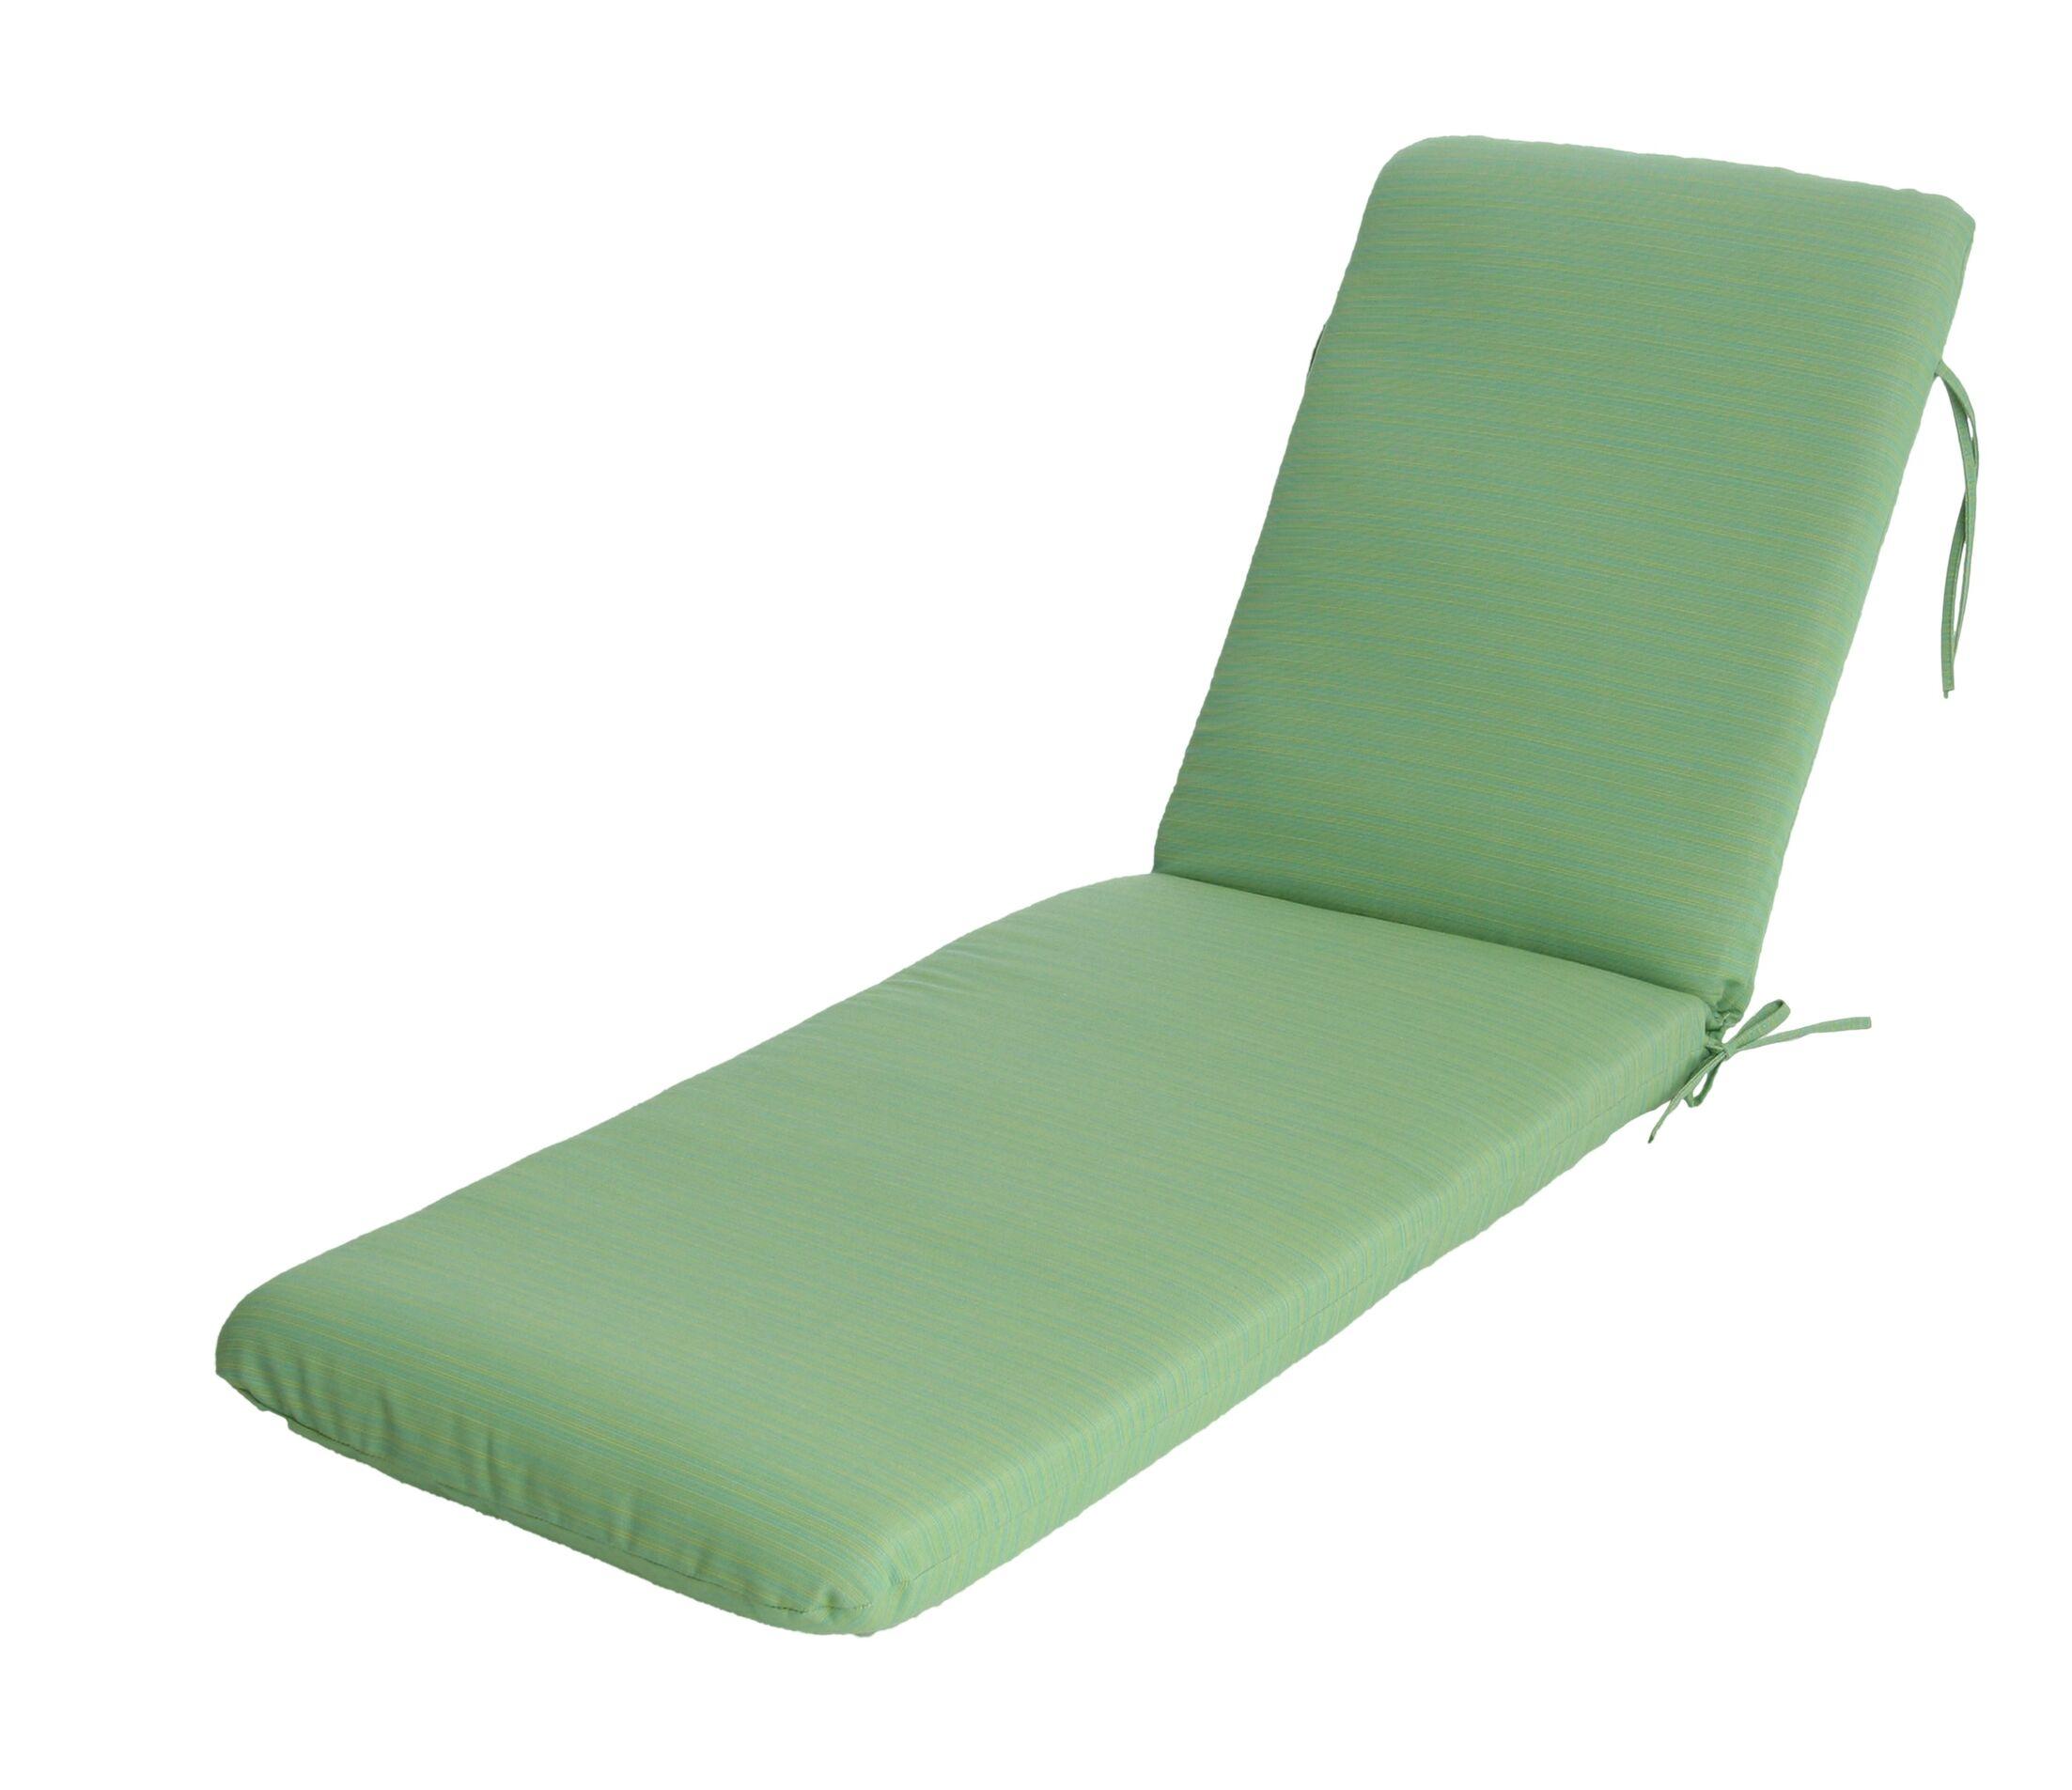 Mindi Indoor/Outdoor Sunbrella Chaise Lounge Cushion Fabric: Paradise